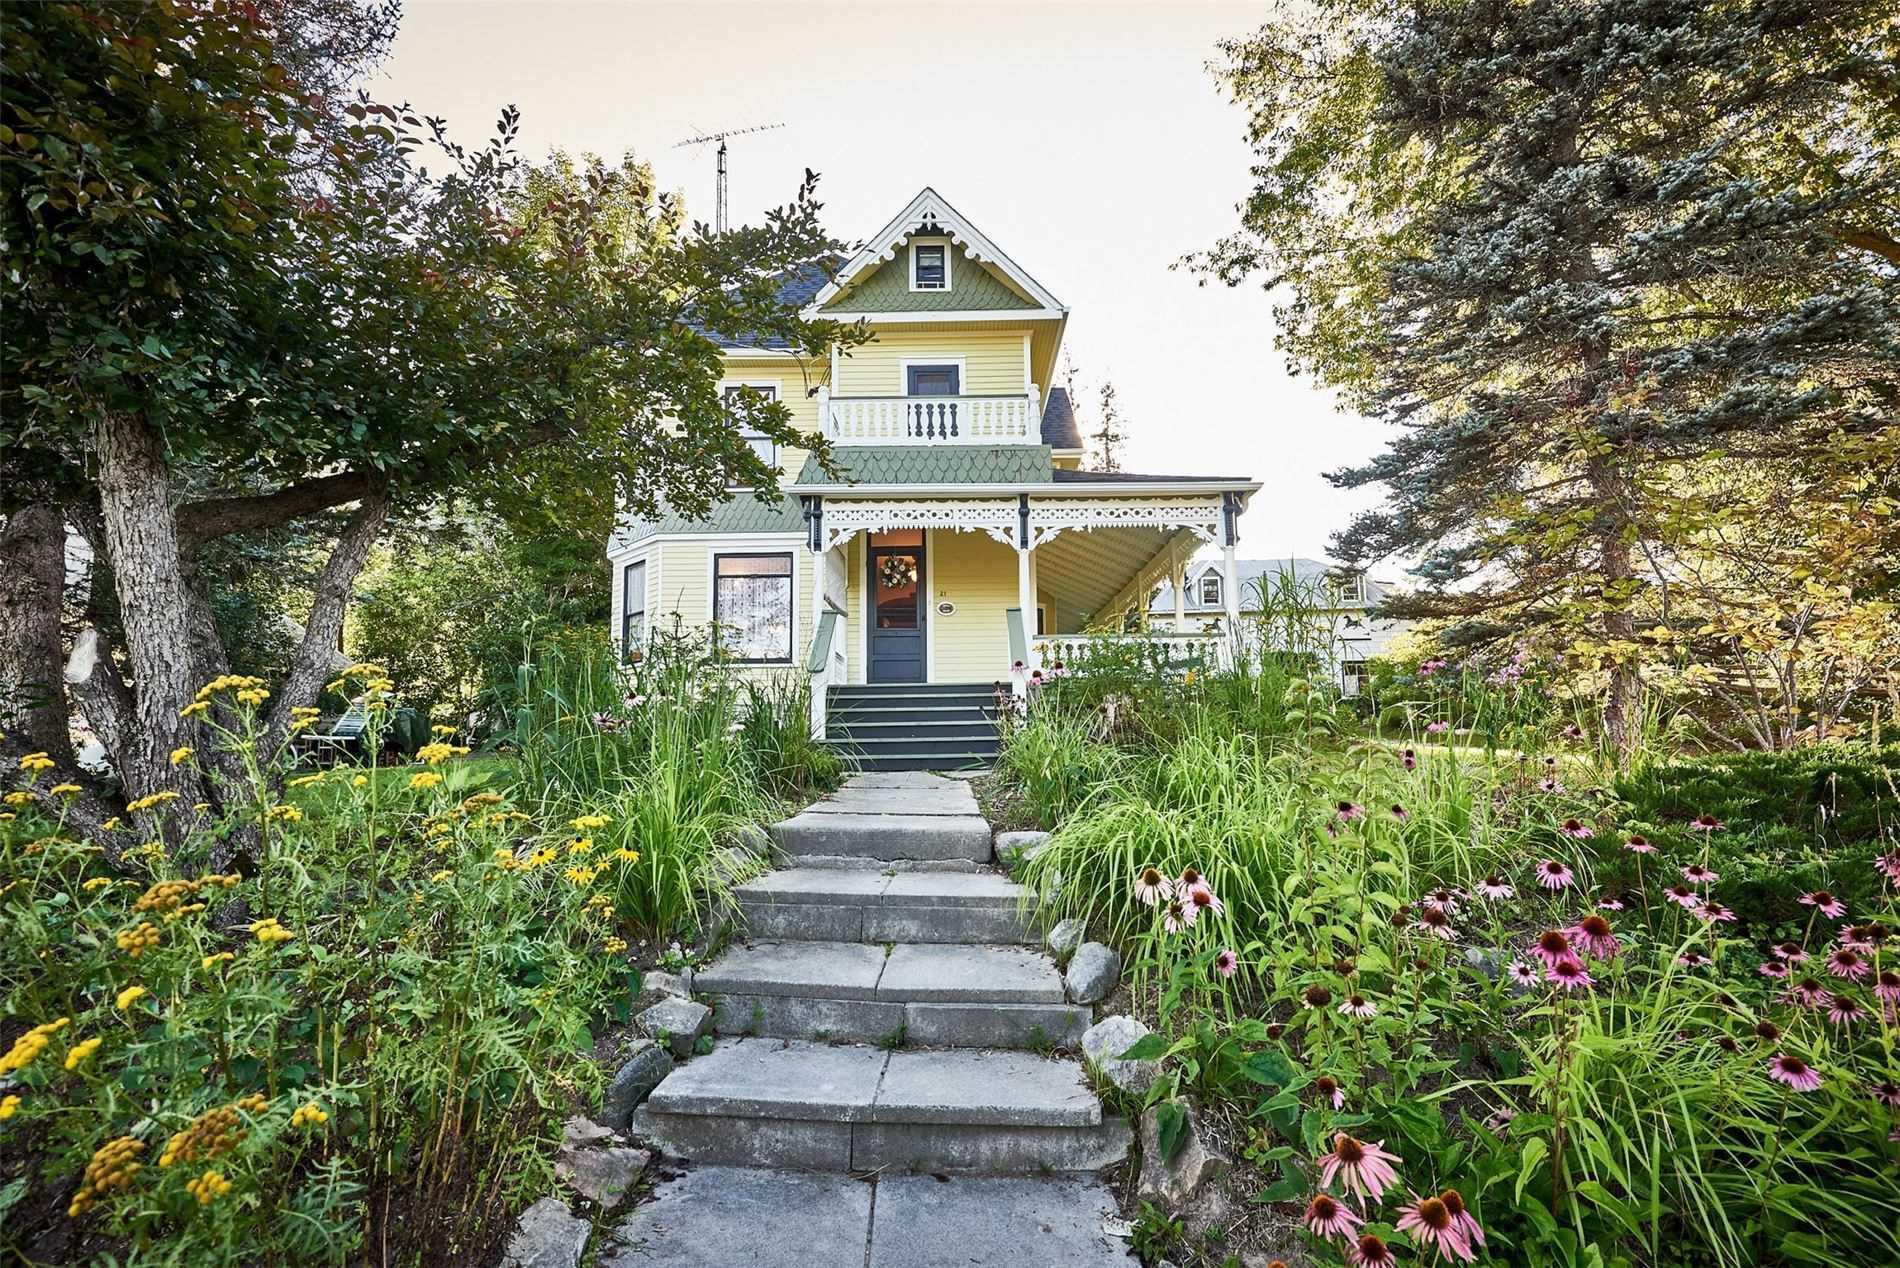 Detached house For Sale In Trent Hills - 21 George St, Trent Hills, Ontario, Canada K0K 3K0 , 3 Bedrooms Bedrooms, ,3 BathroomsBathrooms,Detached,For Sale,George